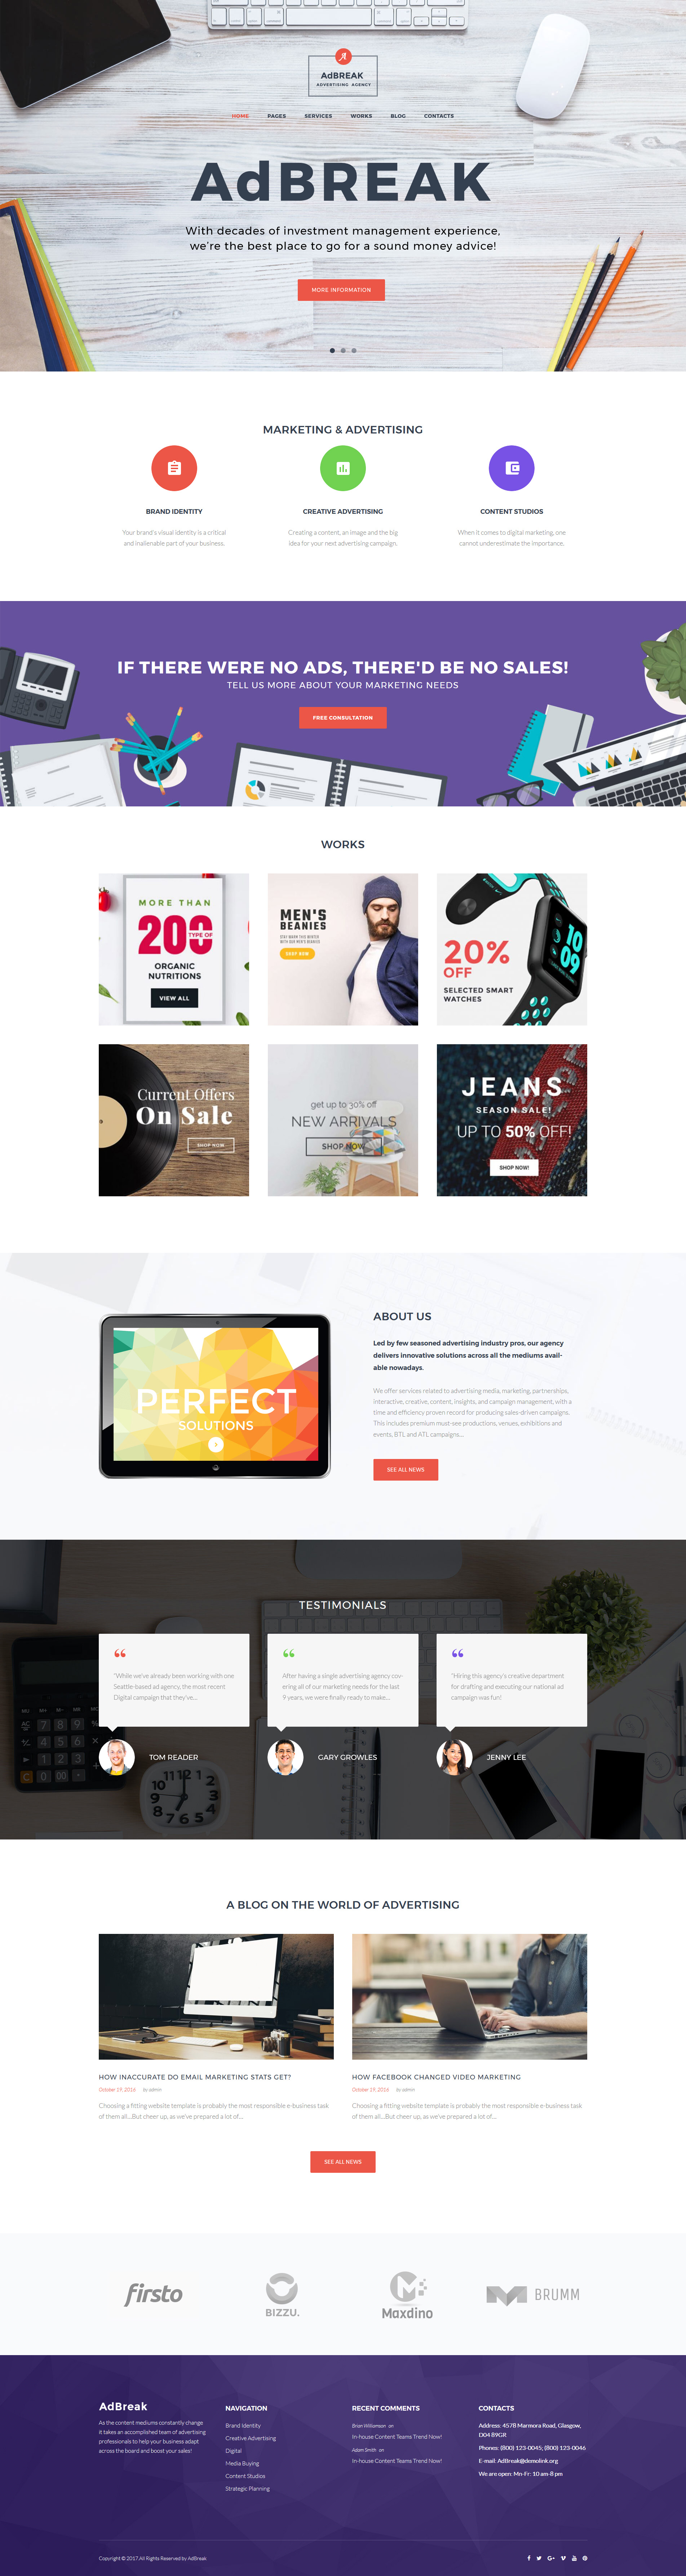 AdBreak - Advertising Company WordPress Theme - screenshot